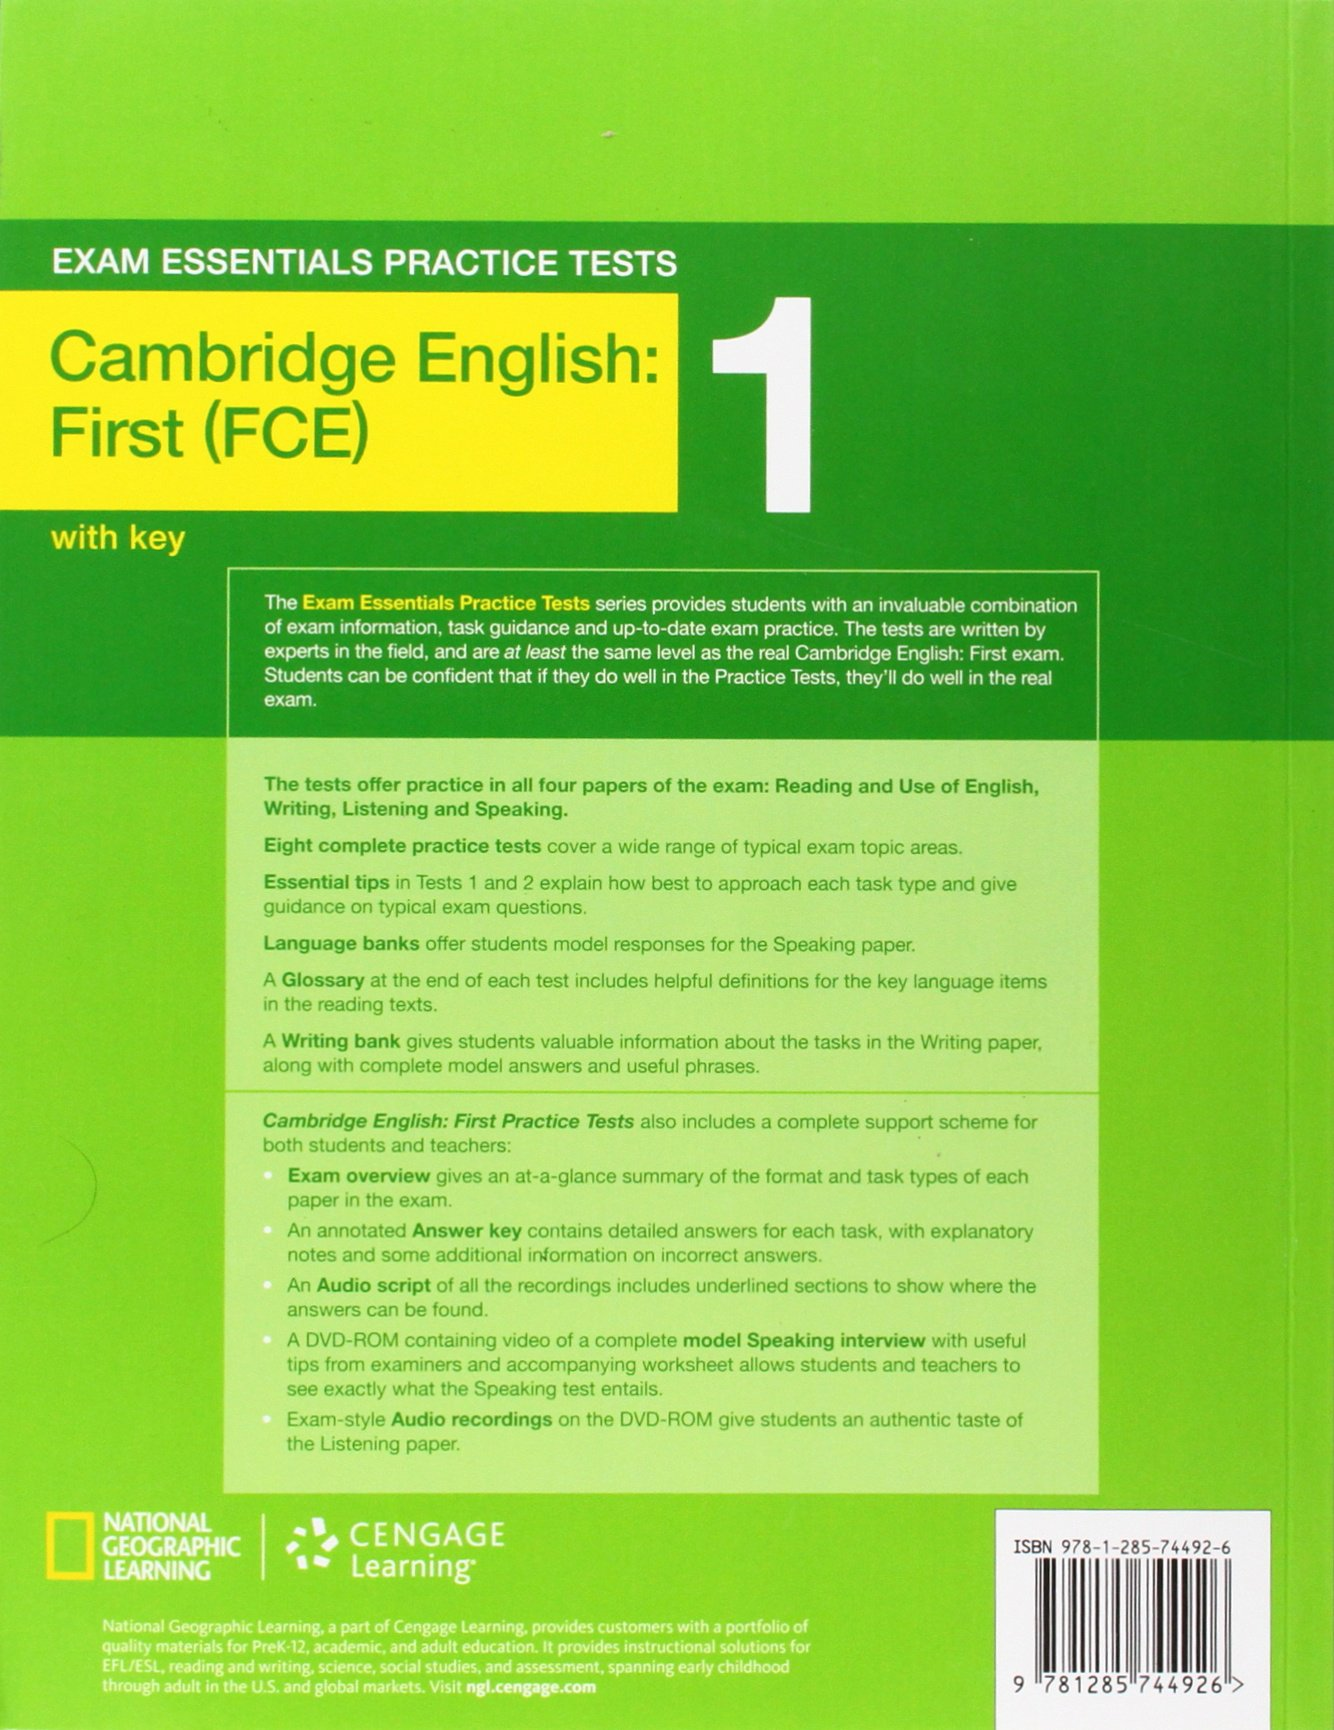 Cambridge english first fce exam essentials practice tests 1 helbling languages exam essentials cambridge first practice tests amazon de charles